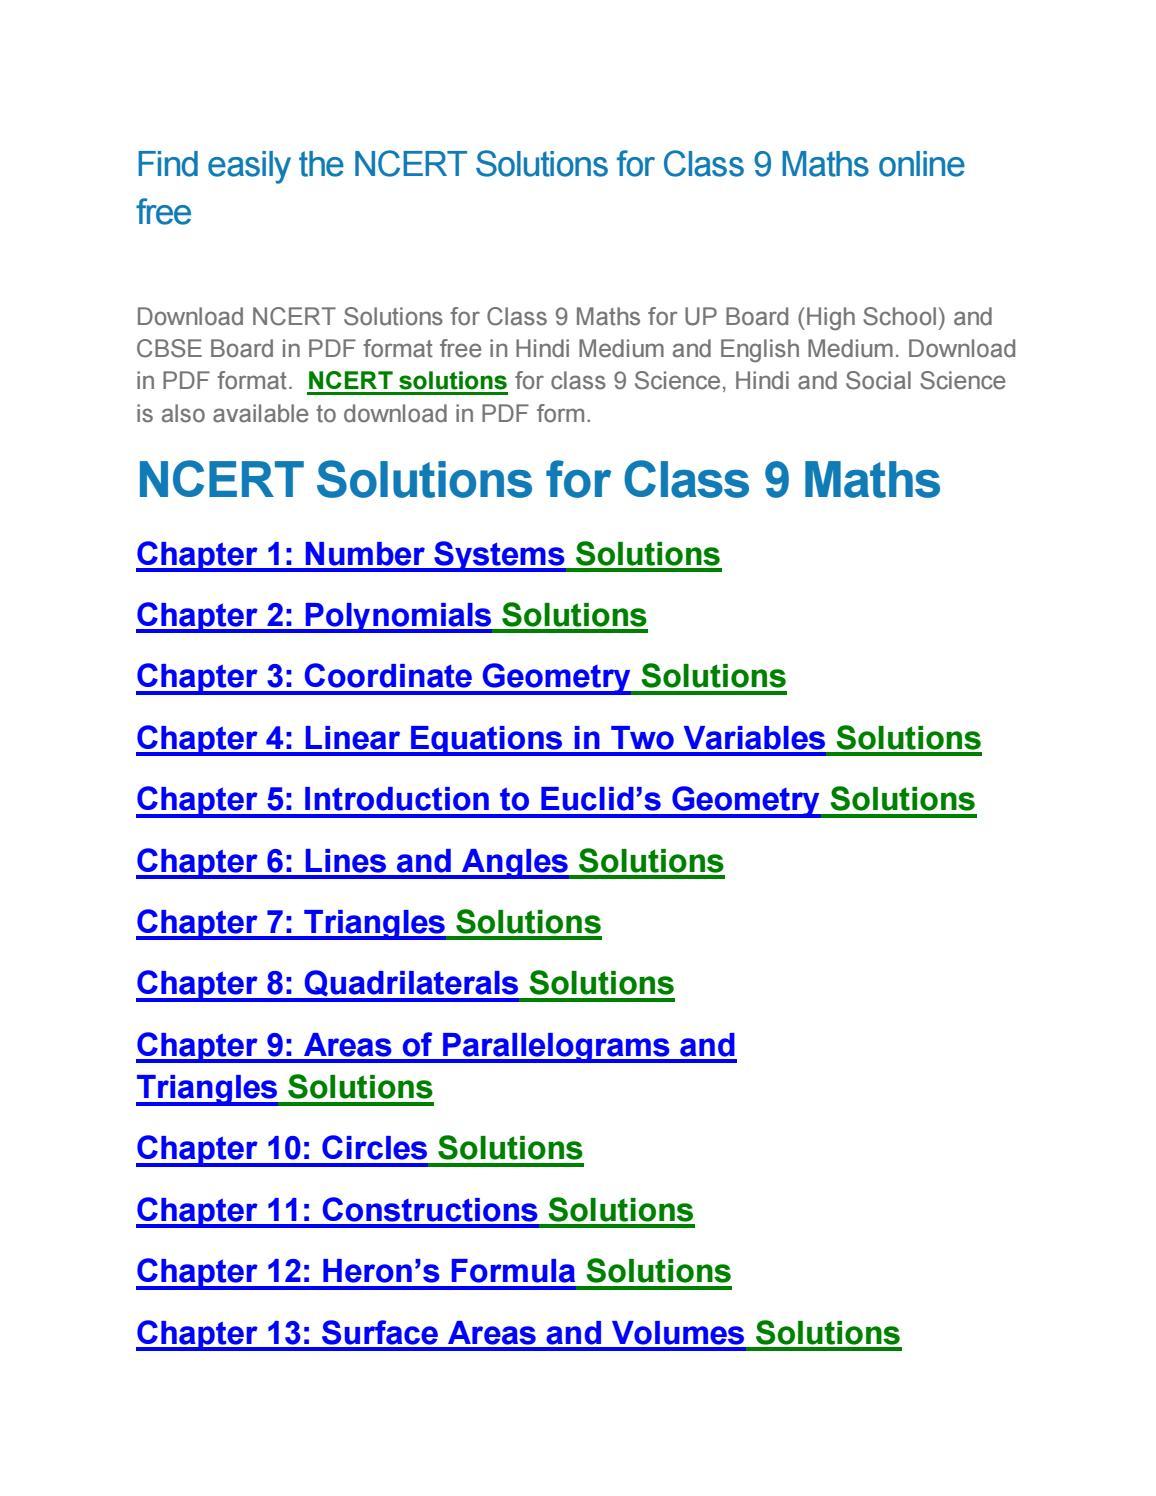 ncert solutions for class 9 maths chapter 11 pdf